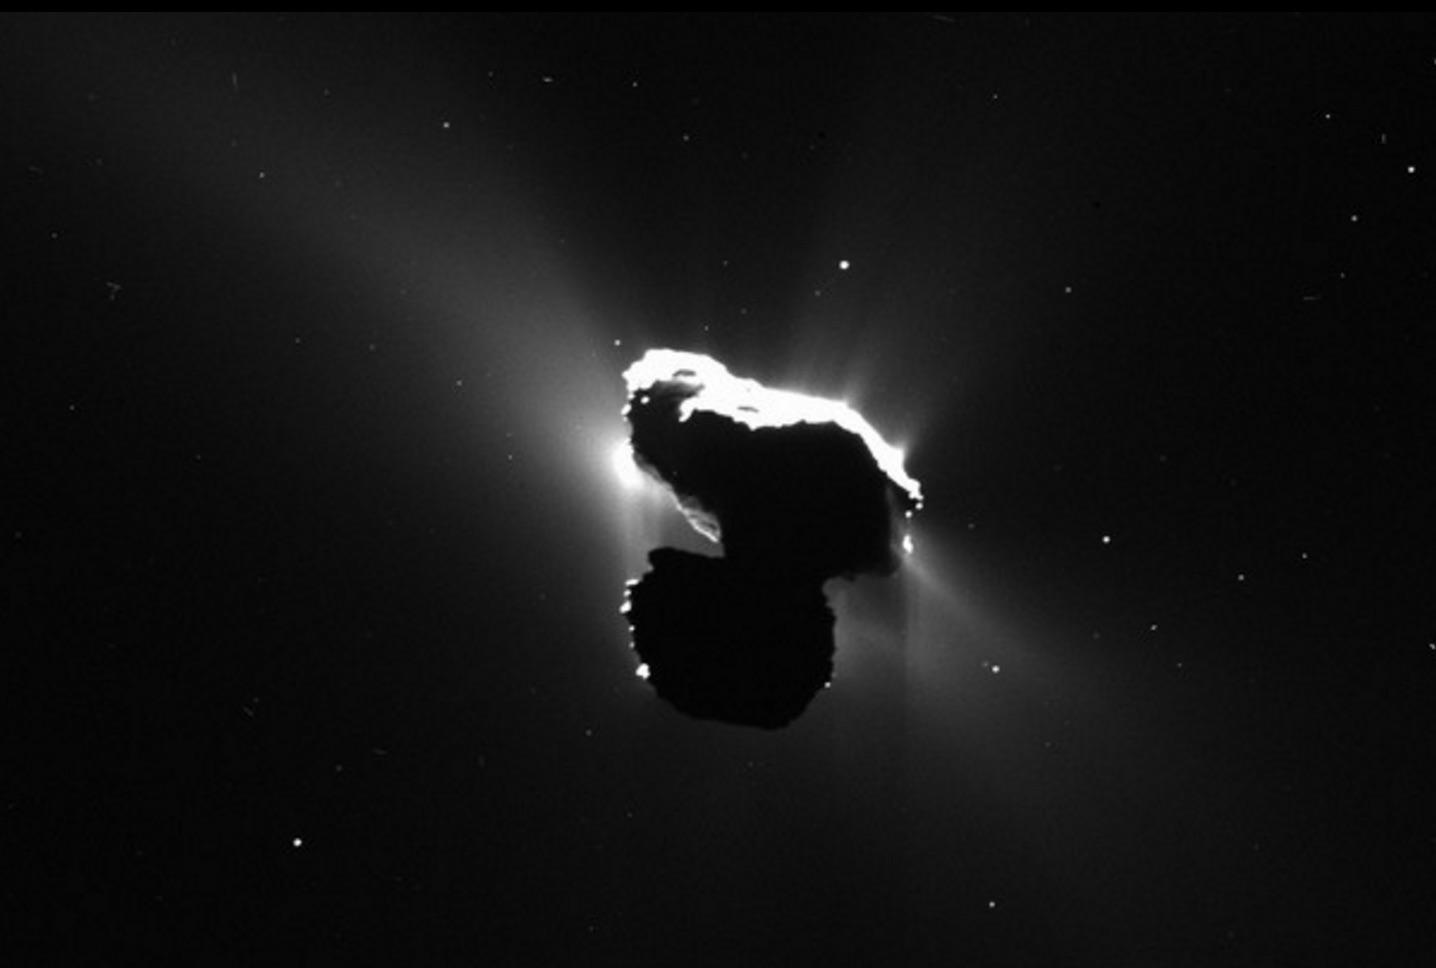 Rosetta Spacecraft Scoops Up Surprise Speck of Fluffy Comet Dust